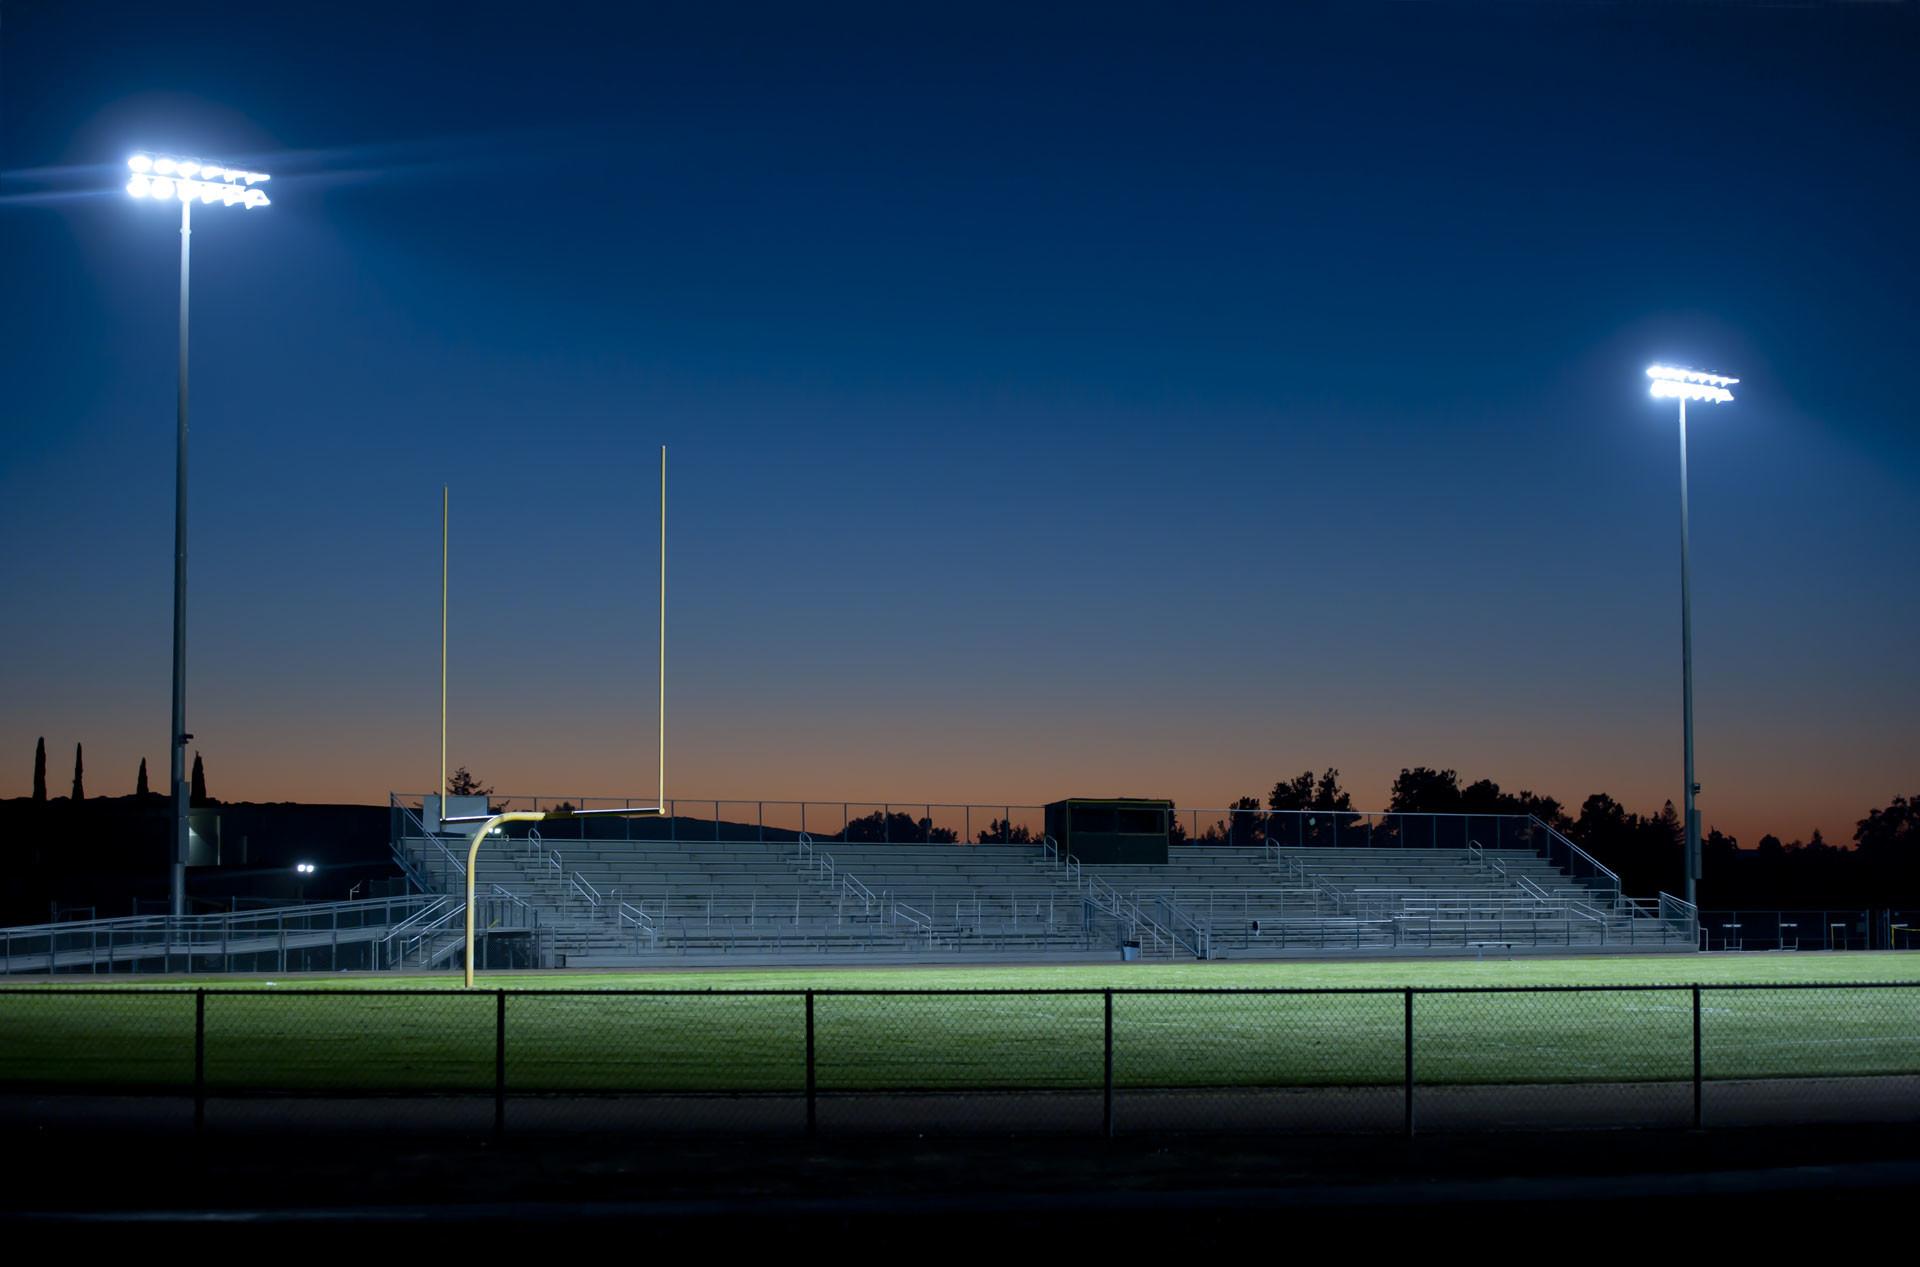 High School Football Stadium Backgrounds | www.galleryhip .